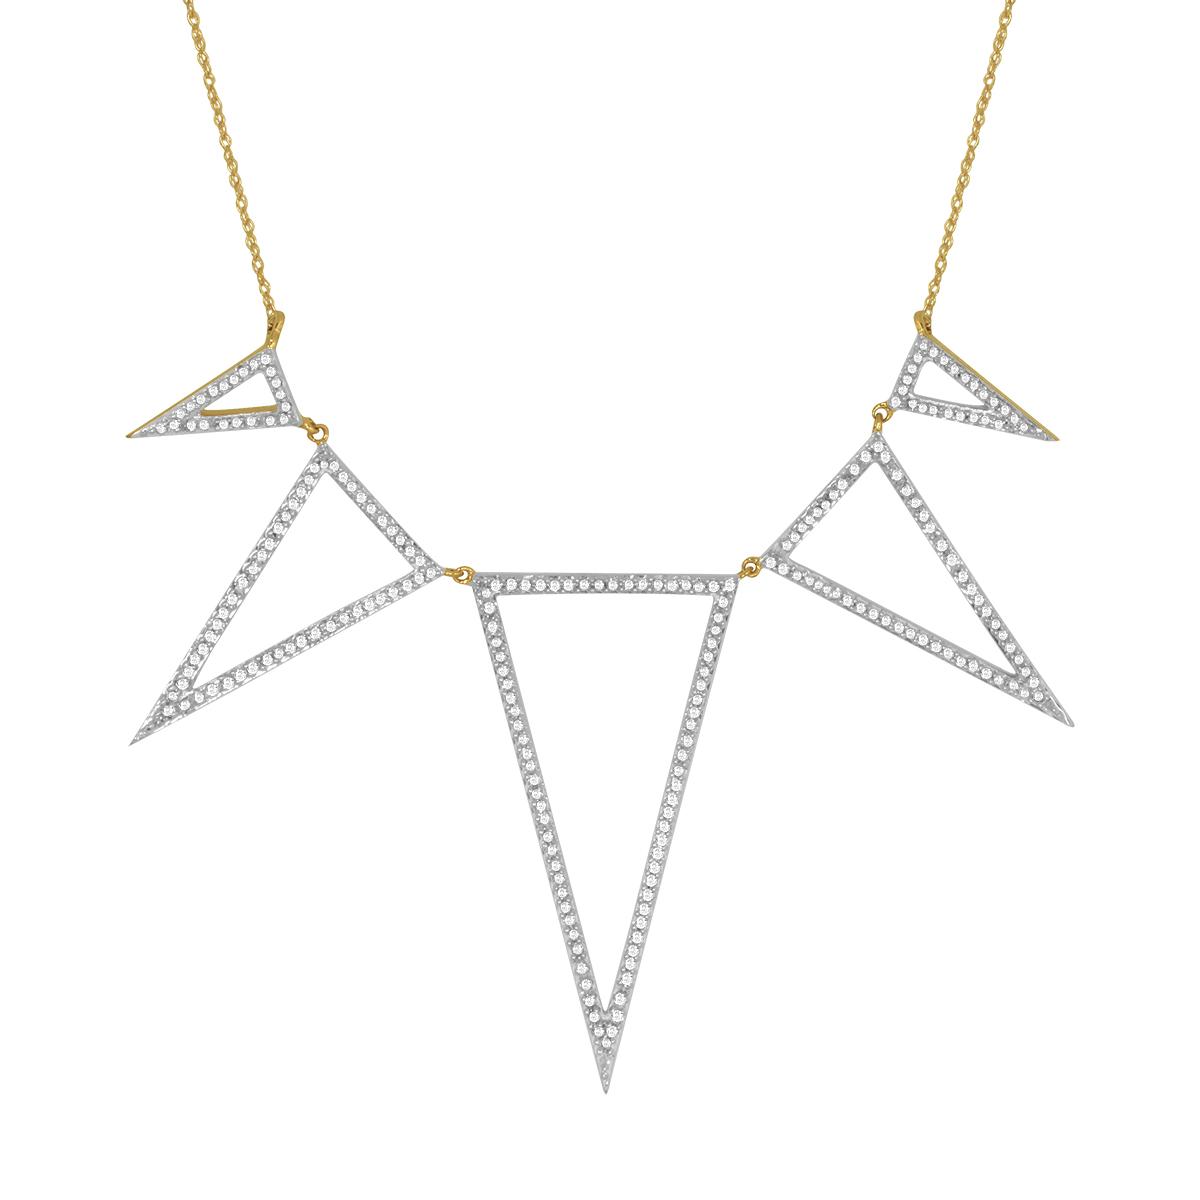 5/8 Carat TW Diamond...